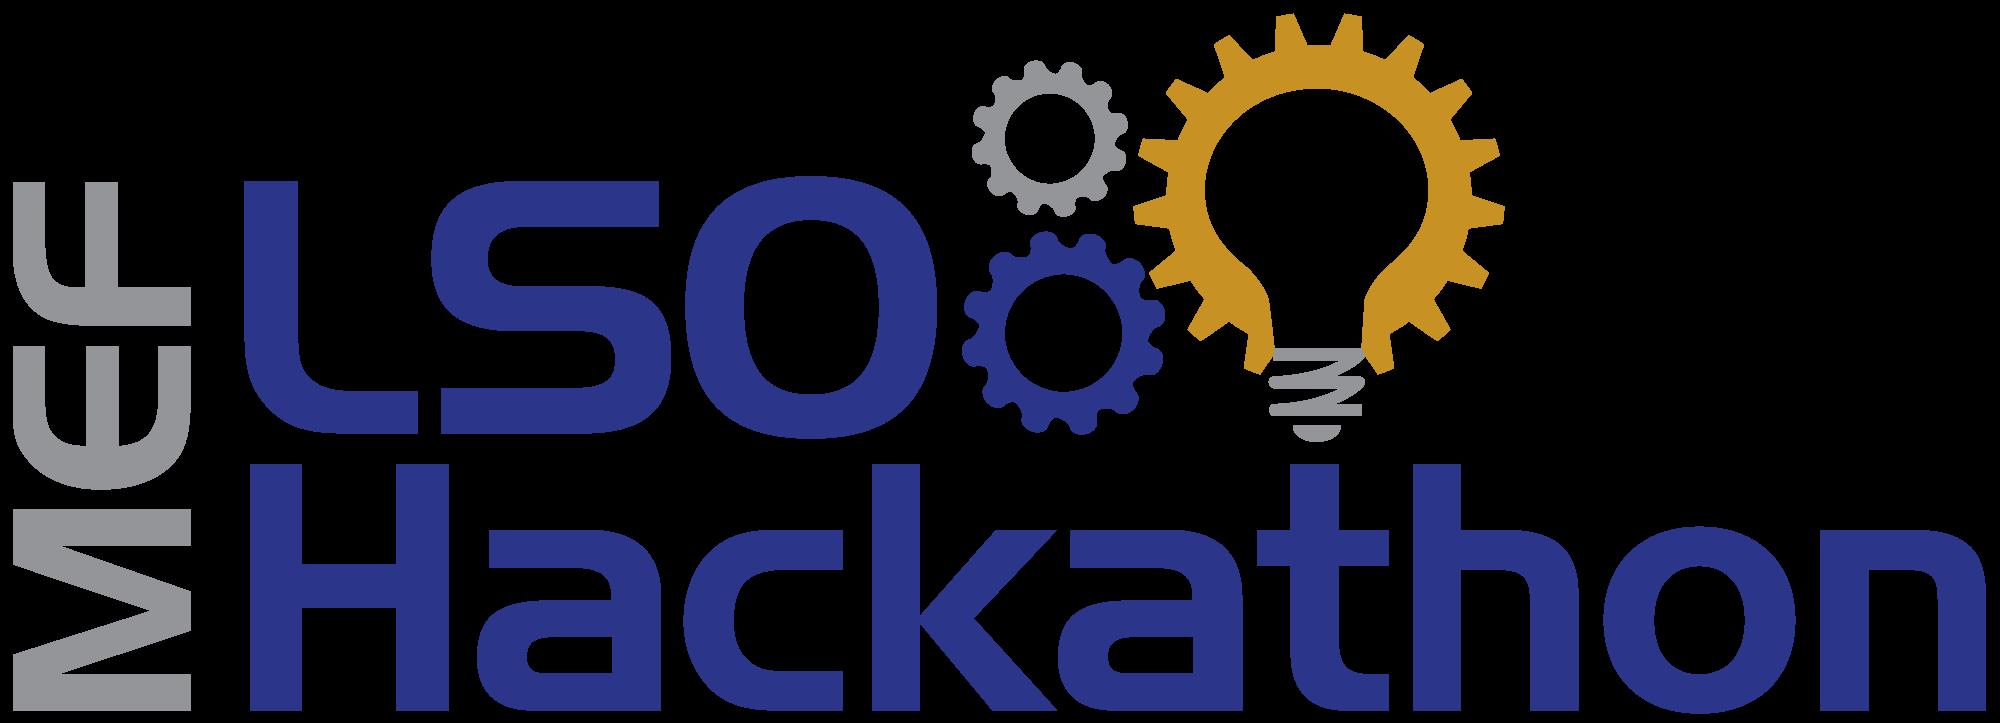 LSO Hackathon